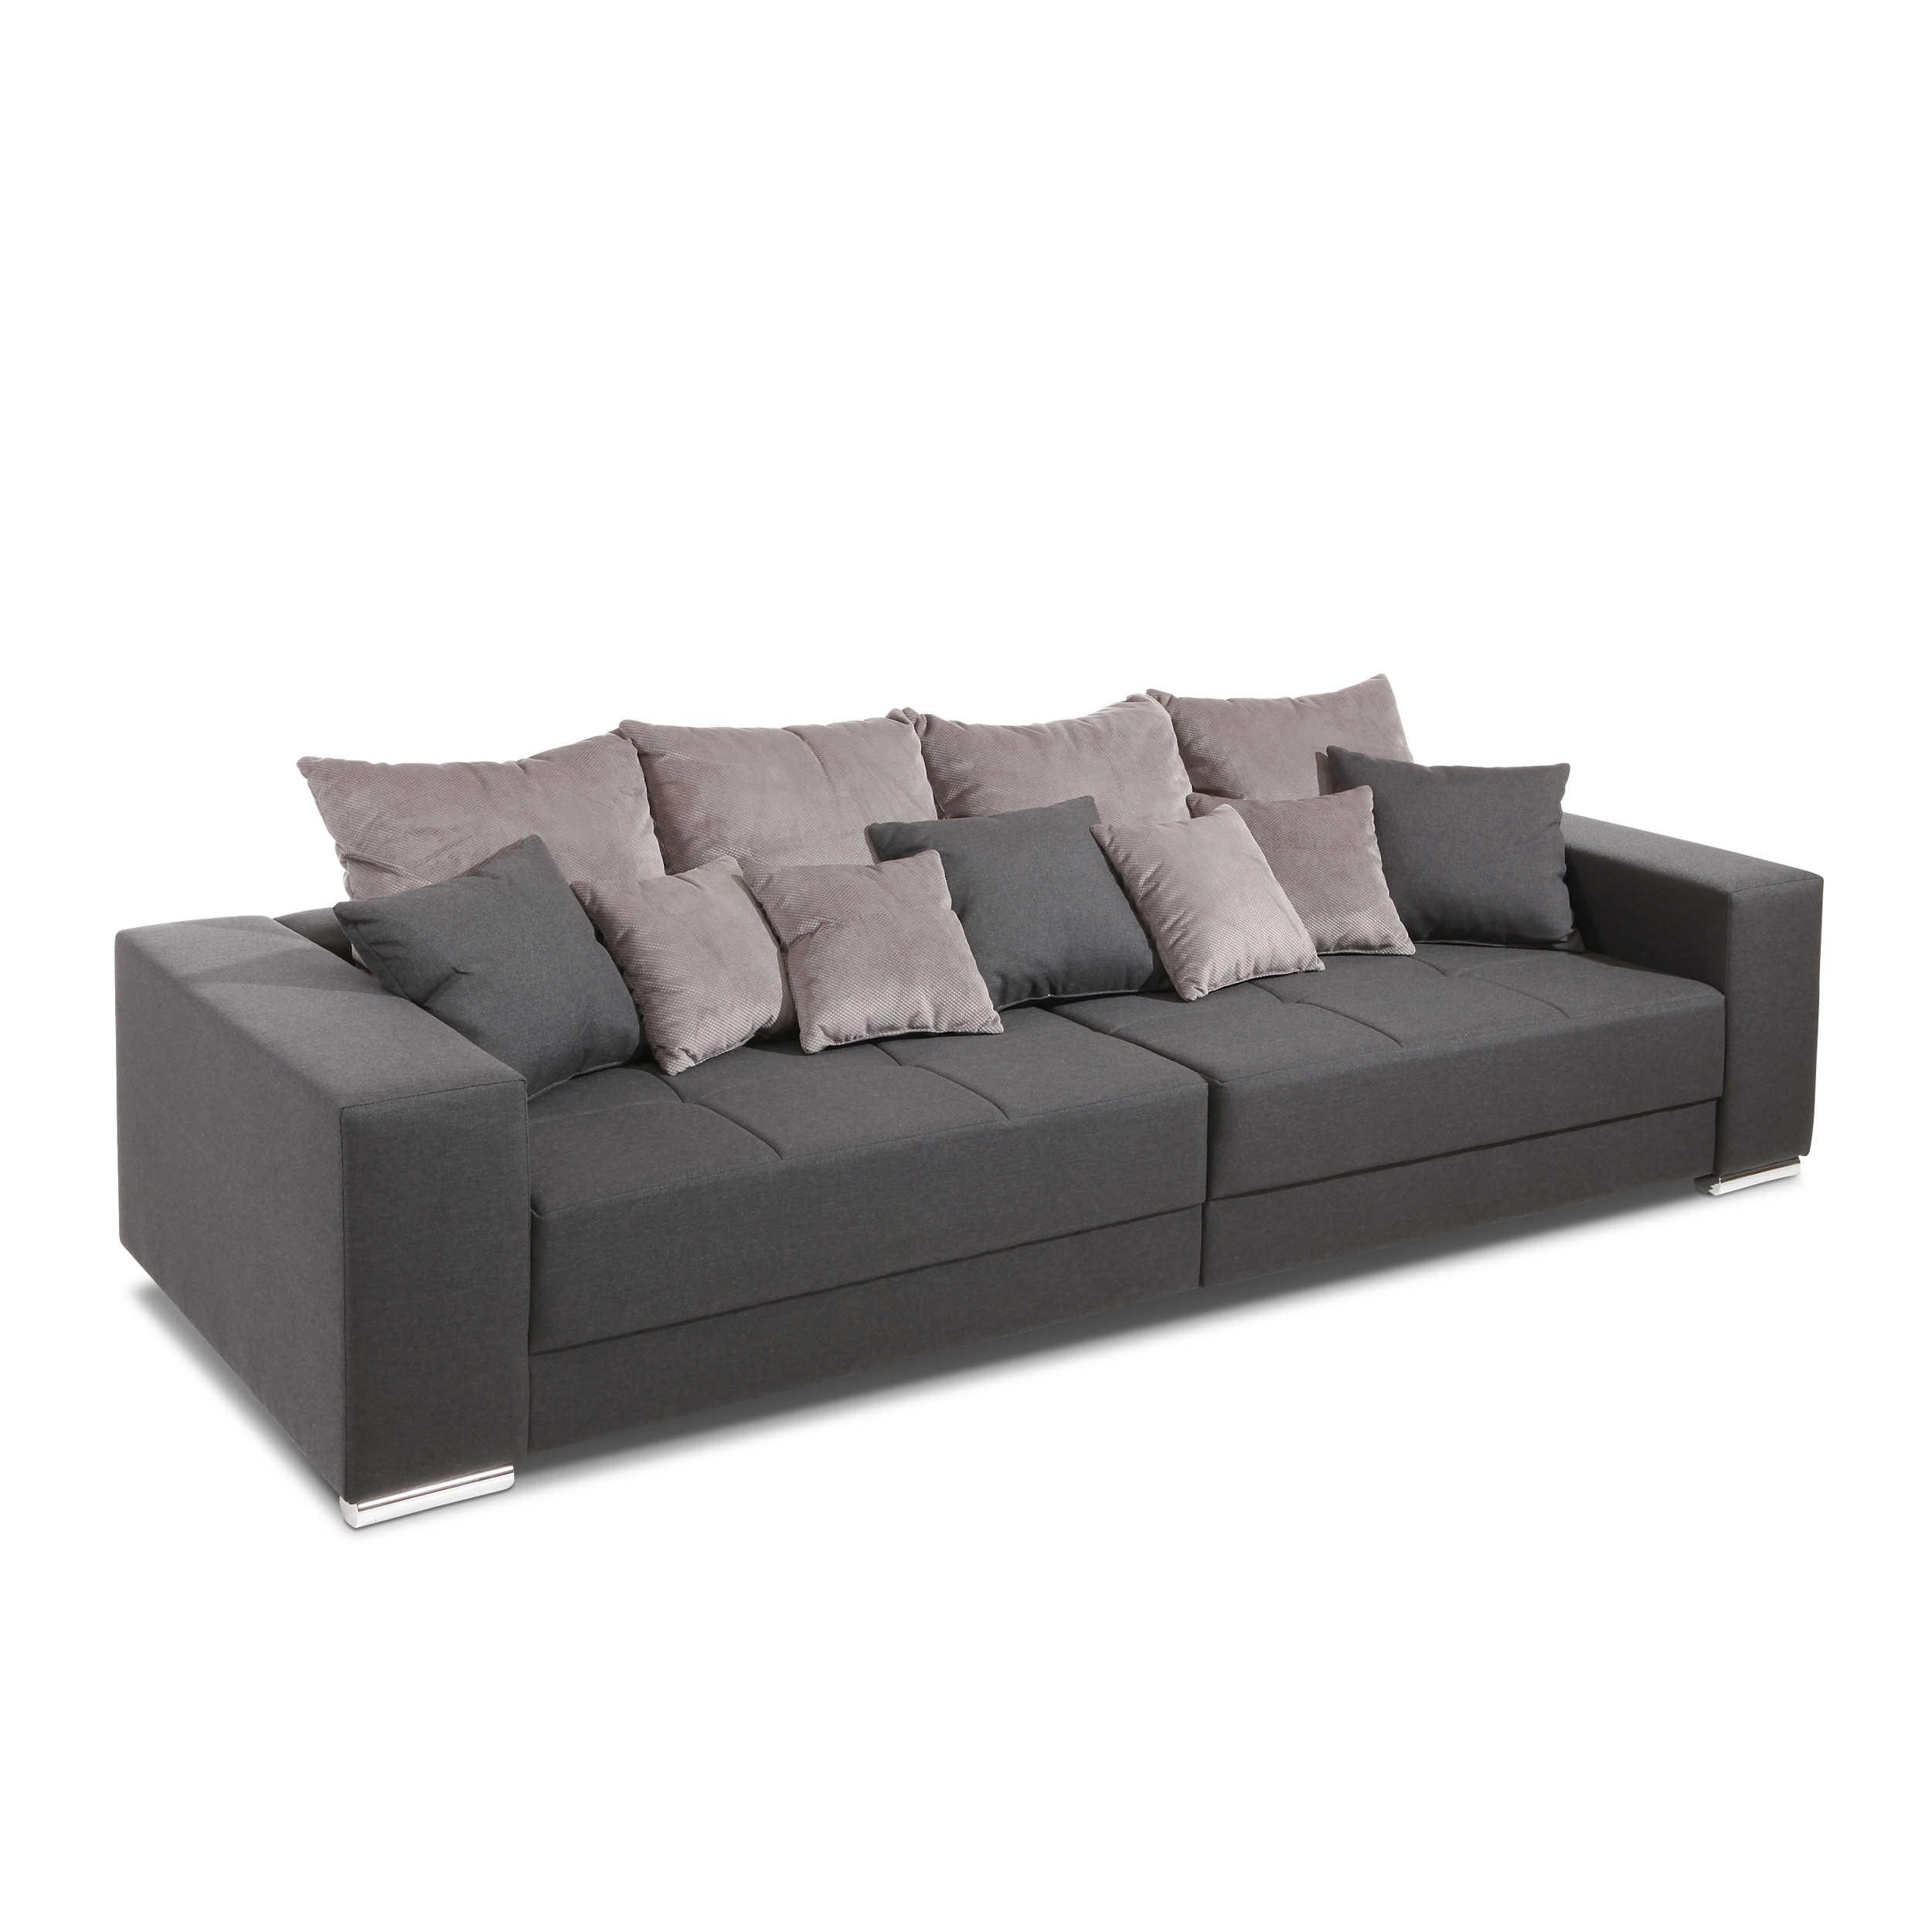 sofa adro grau stoff online kaufen bei woonio. Black Bedroom Furniture Sets. Home Design Ideas